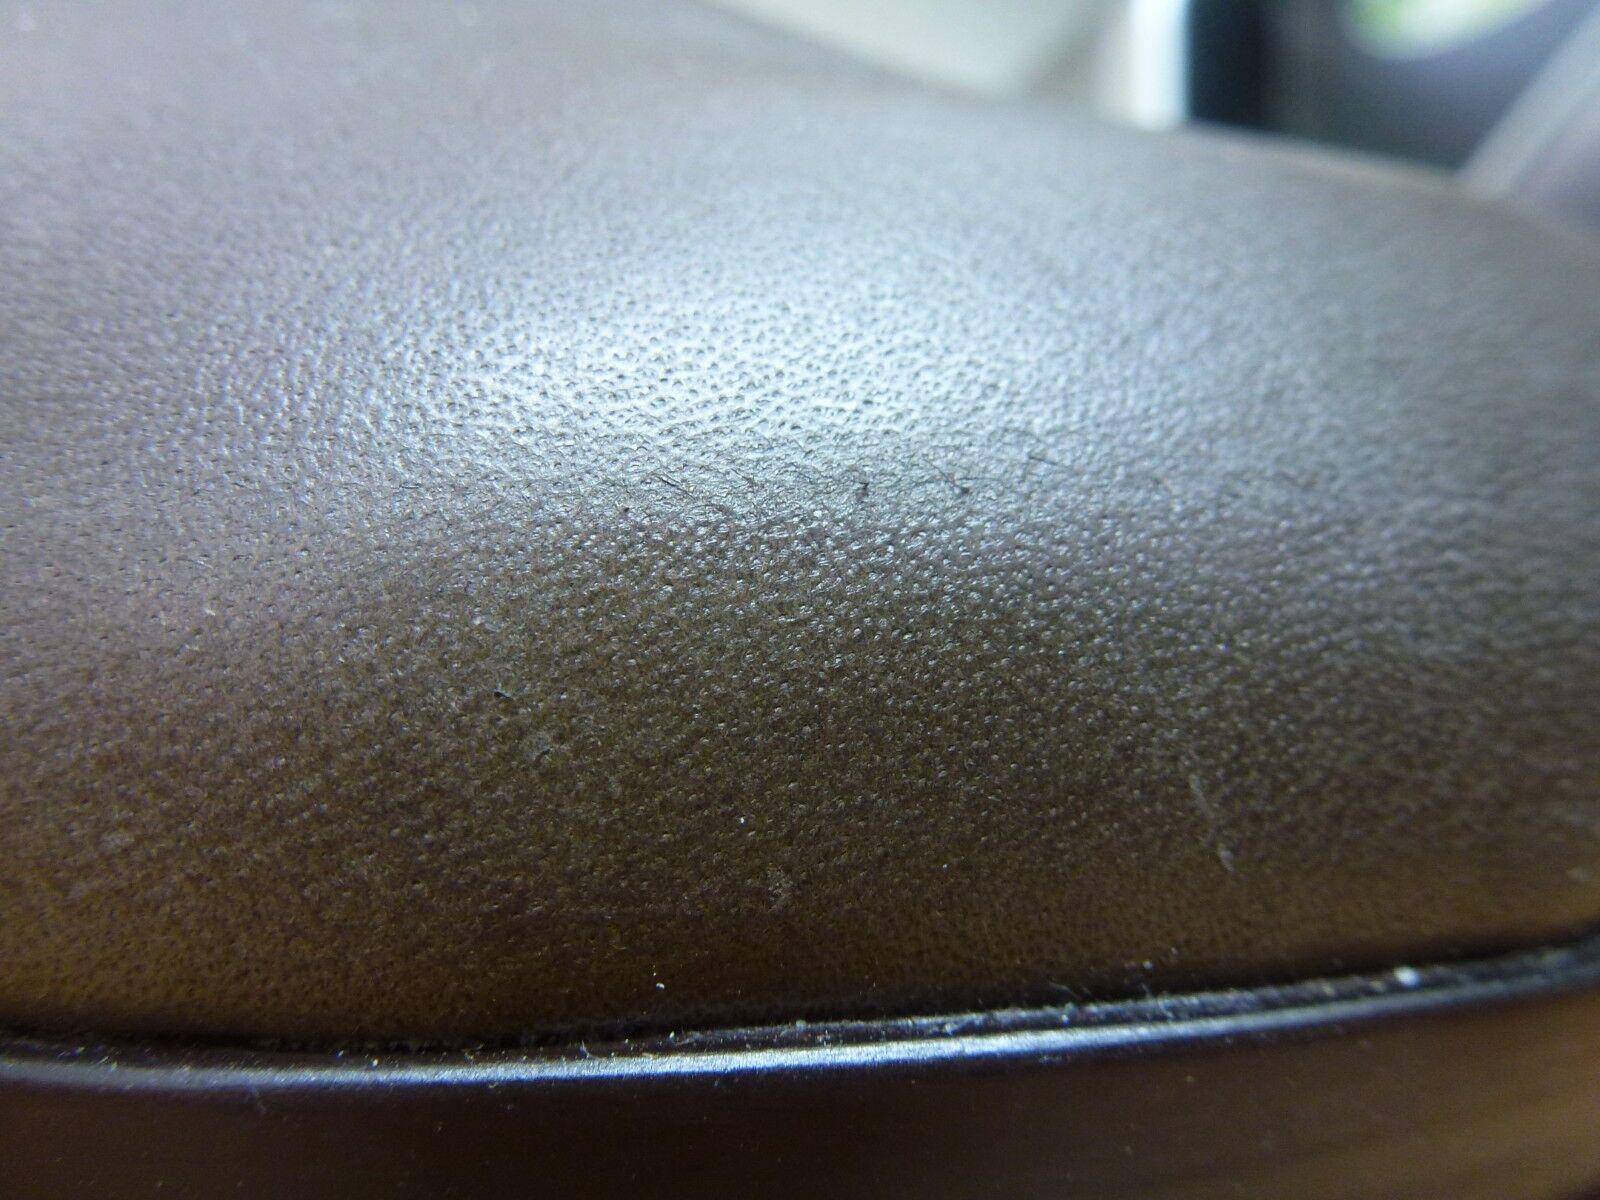 MANAS Leder Asymmetric Top Block Heel Ankle Stiefel  Größe 7/40 BNWT  Stiefel Taupe db8338